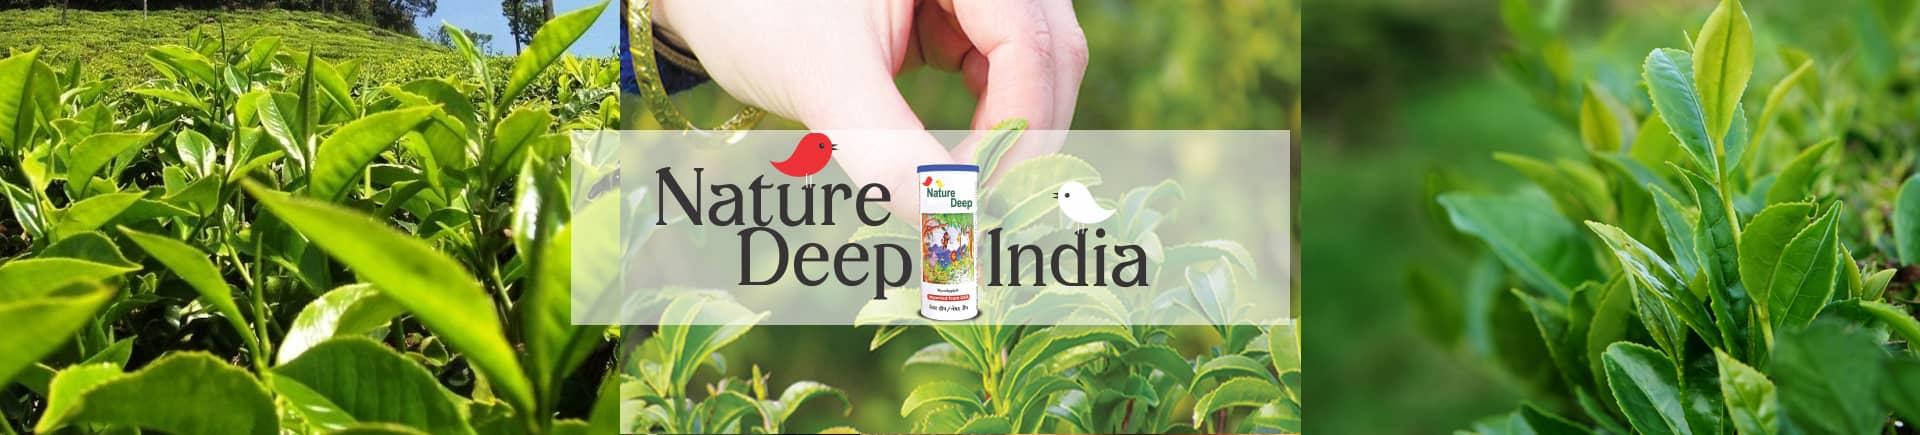 sumitomo naturedeep for tea crop desktop banner